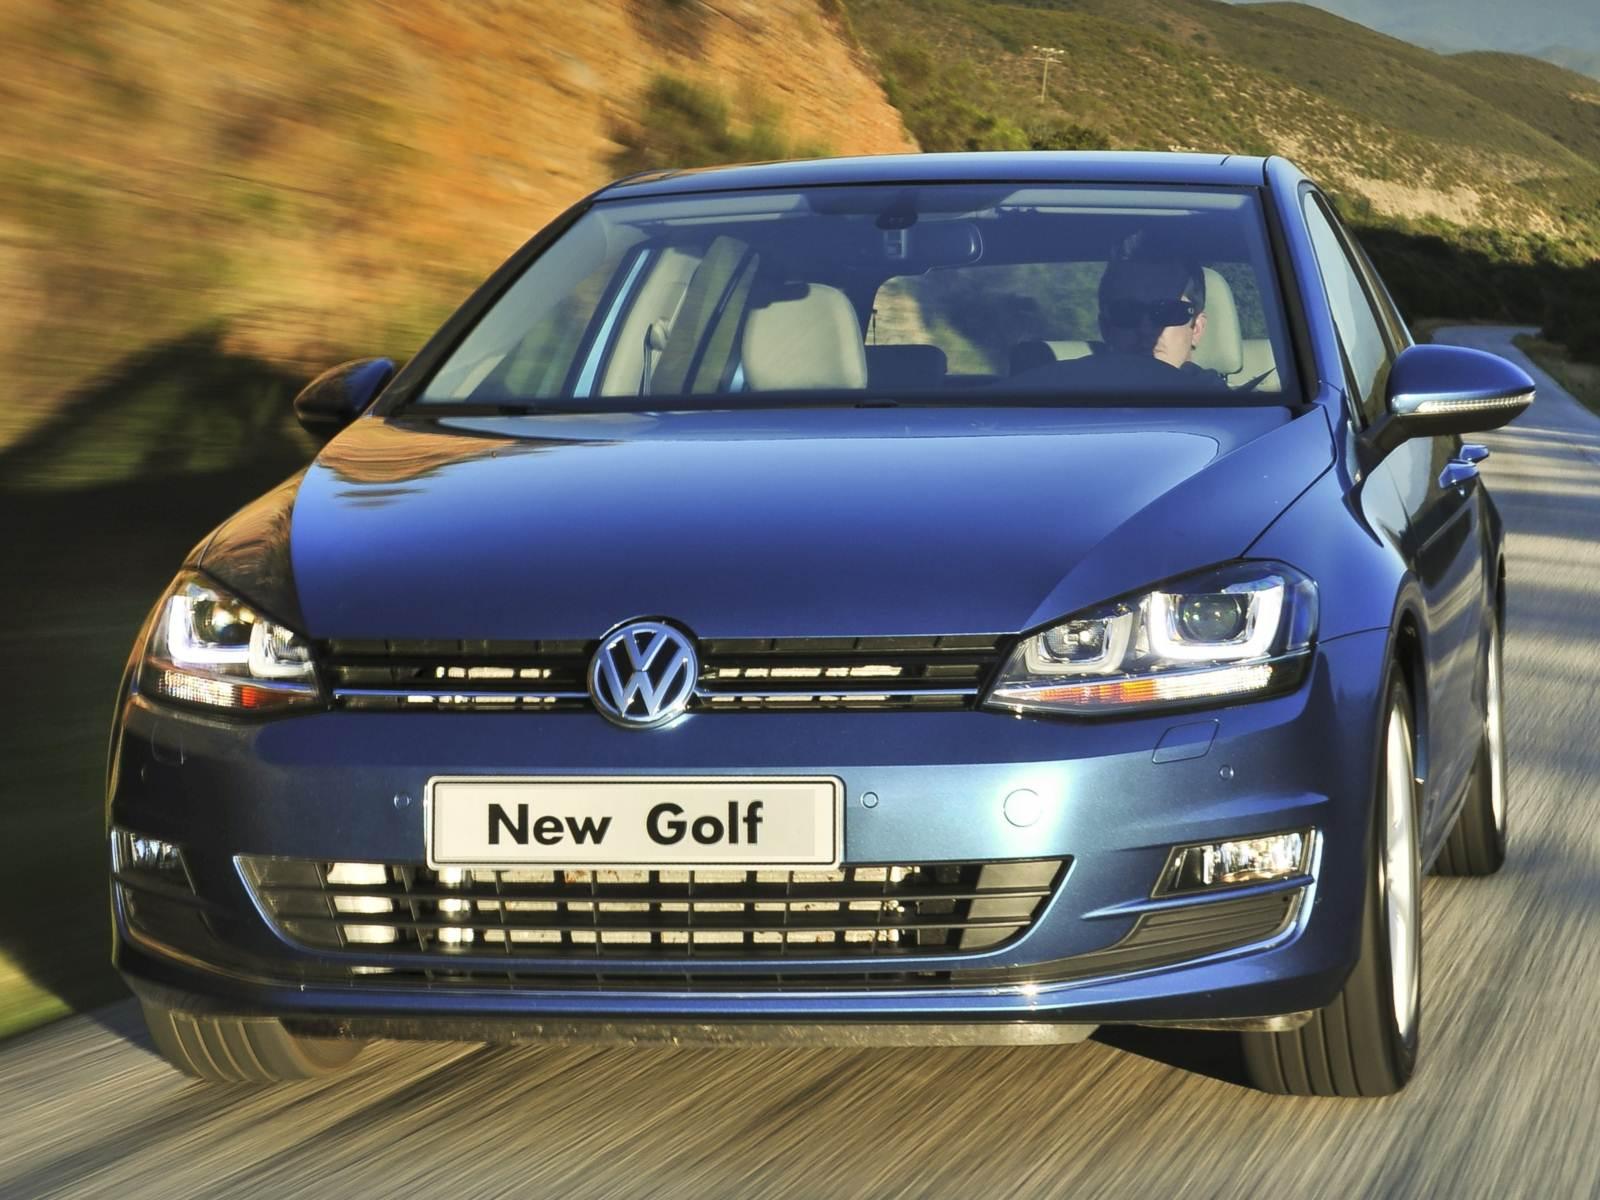 Volkswagen Golf - líder de vendas na Espanha